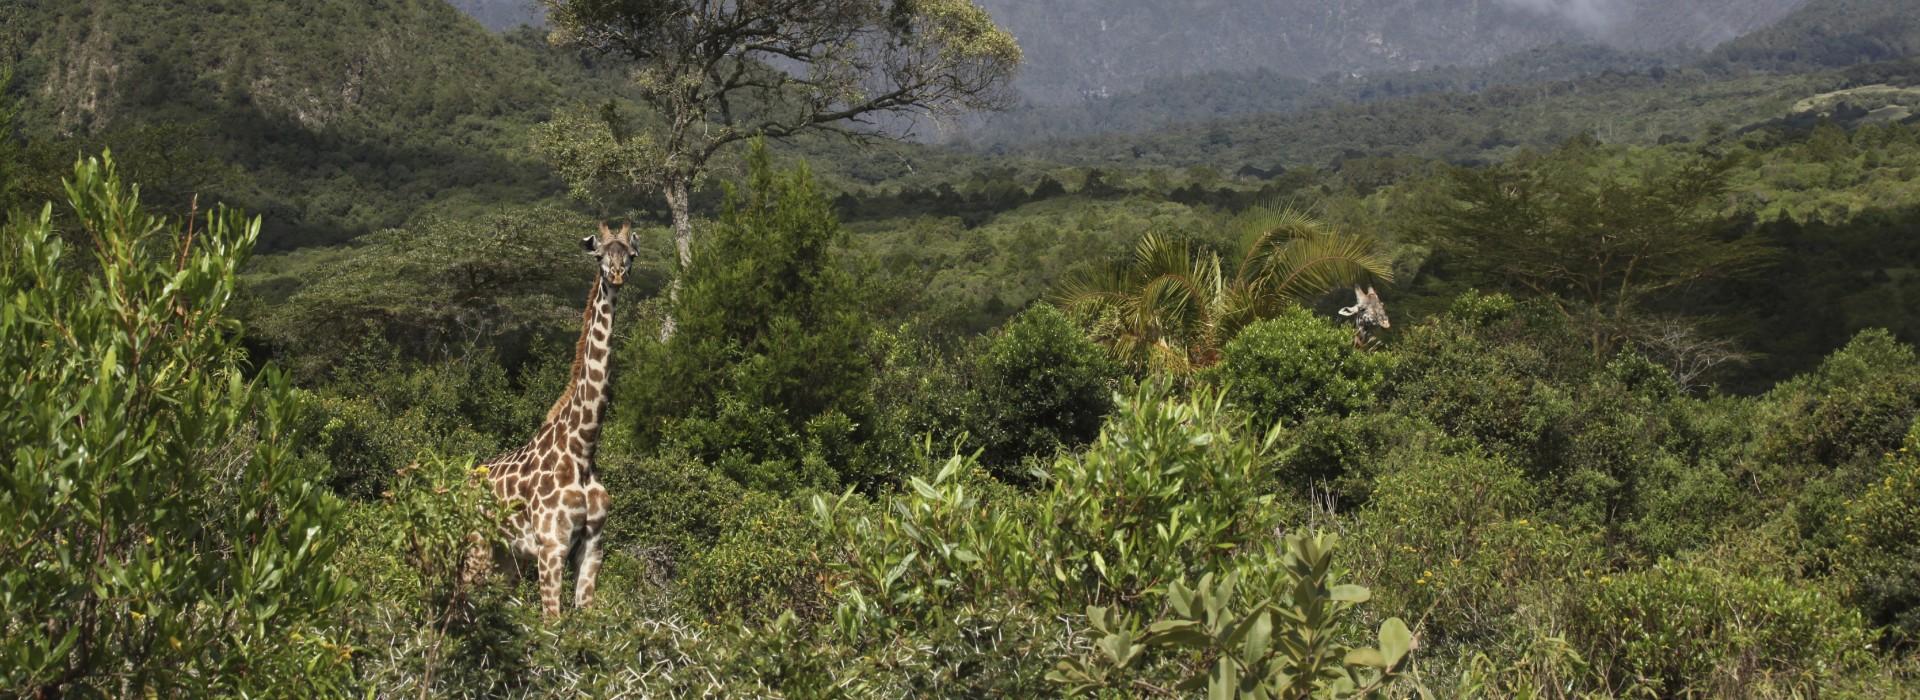 Giraffe grazing at the Arusha National Park